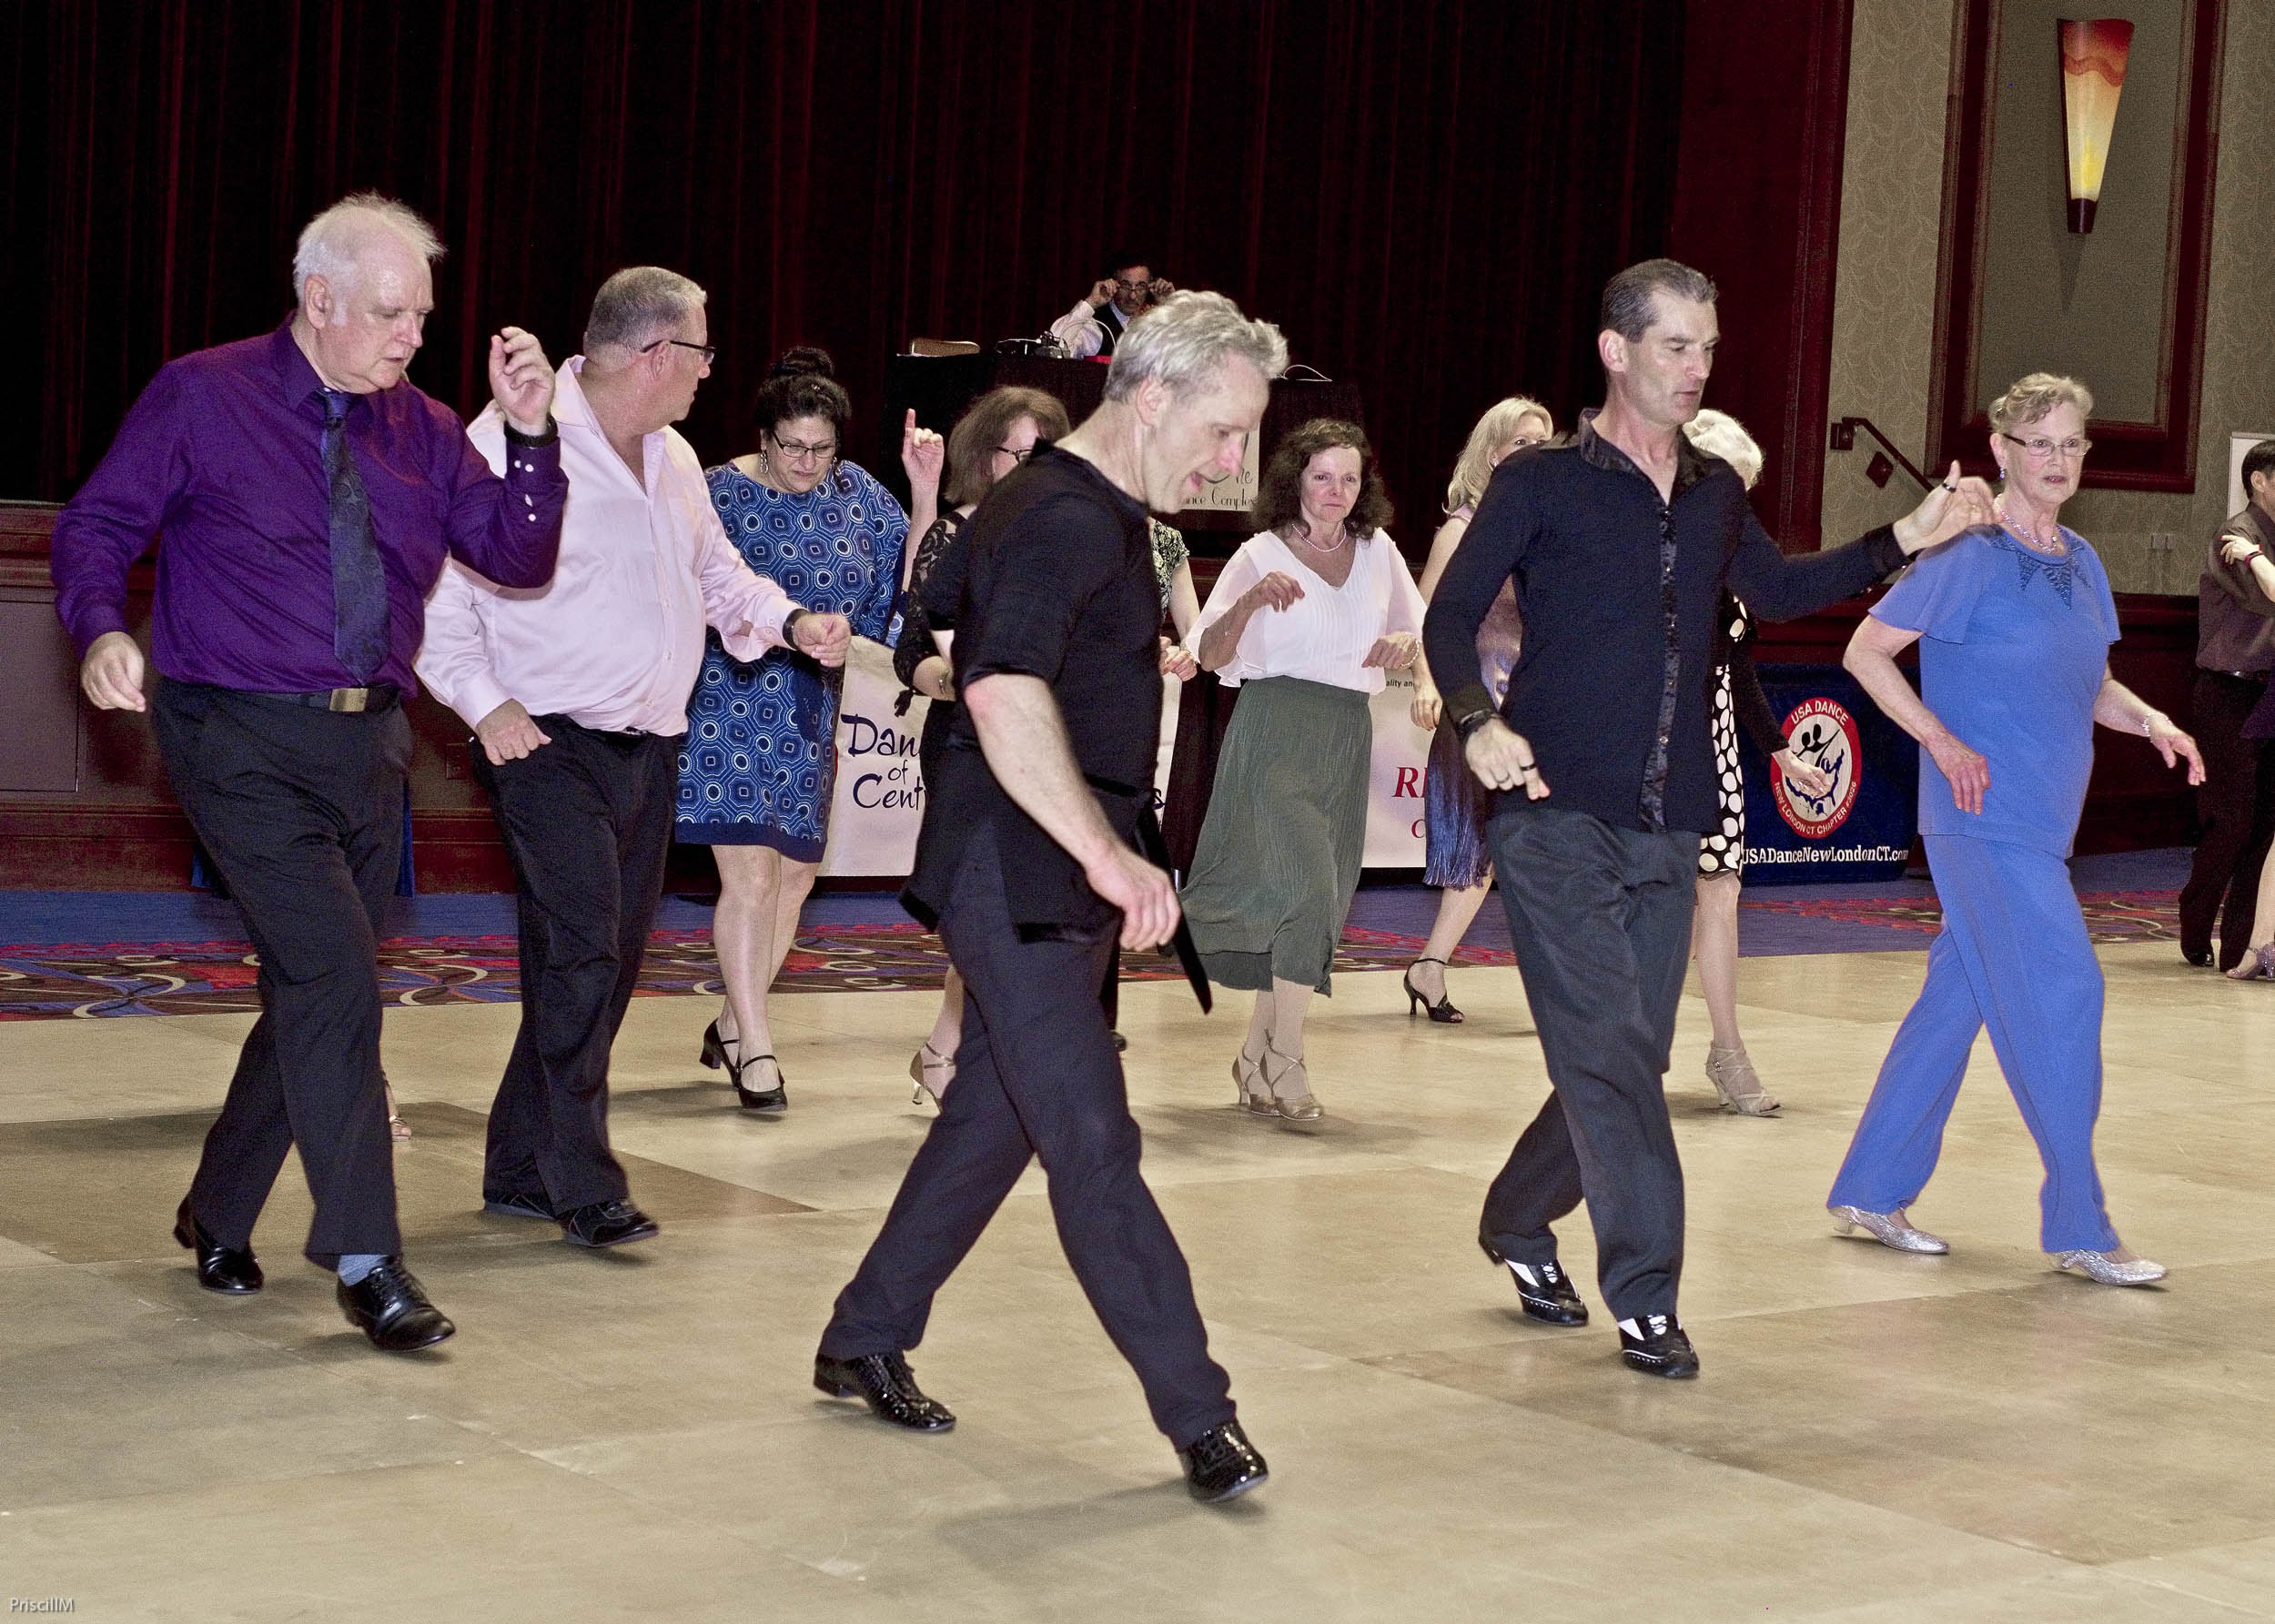 USA Dance Regional Fall Social Dancers 3